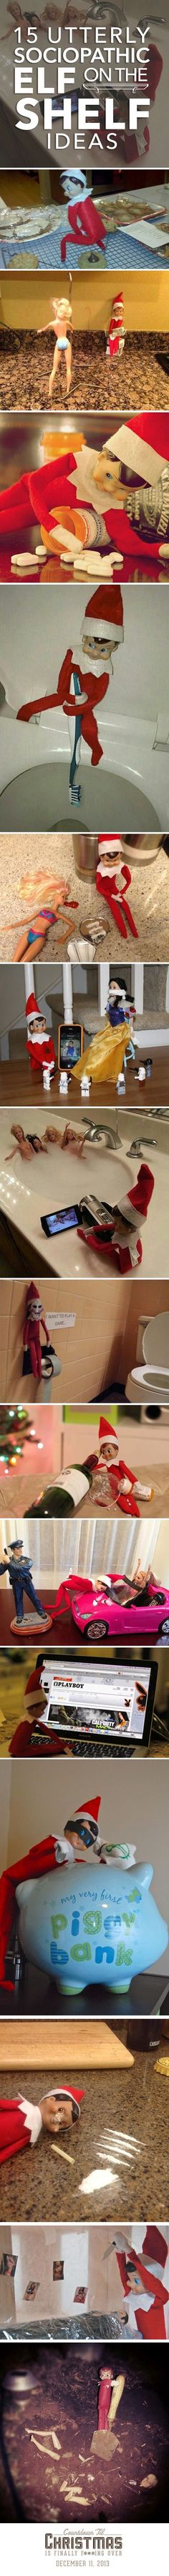 Love the Dexter elf lol